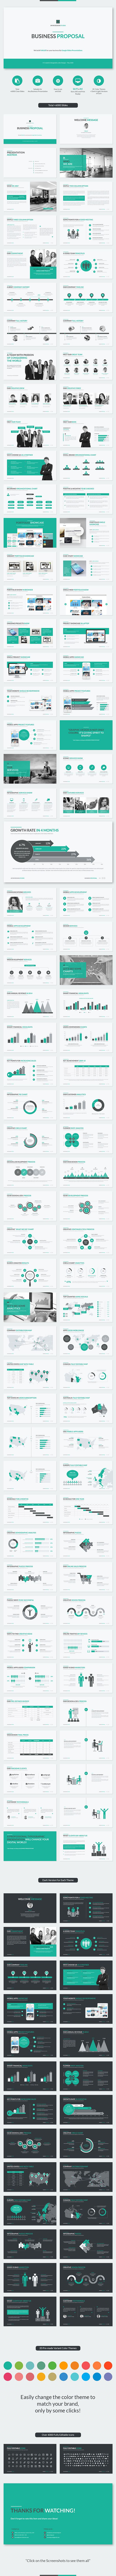 Pueden cambiarse los colores Business Proposal Google Slides Template - Google Slides Presentation Templates